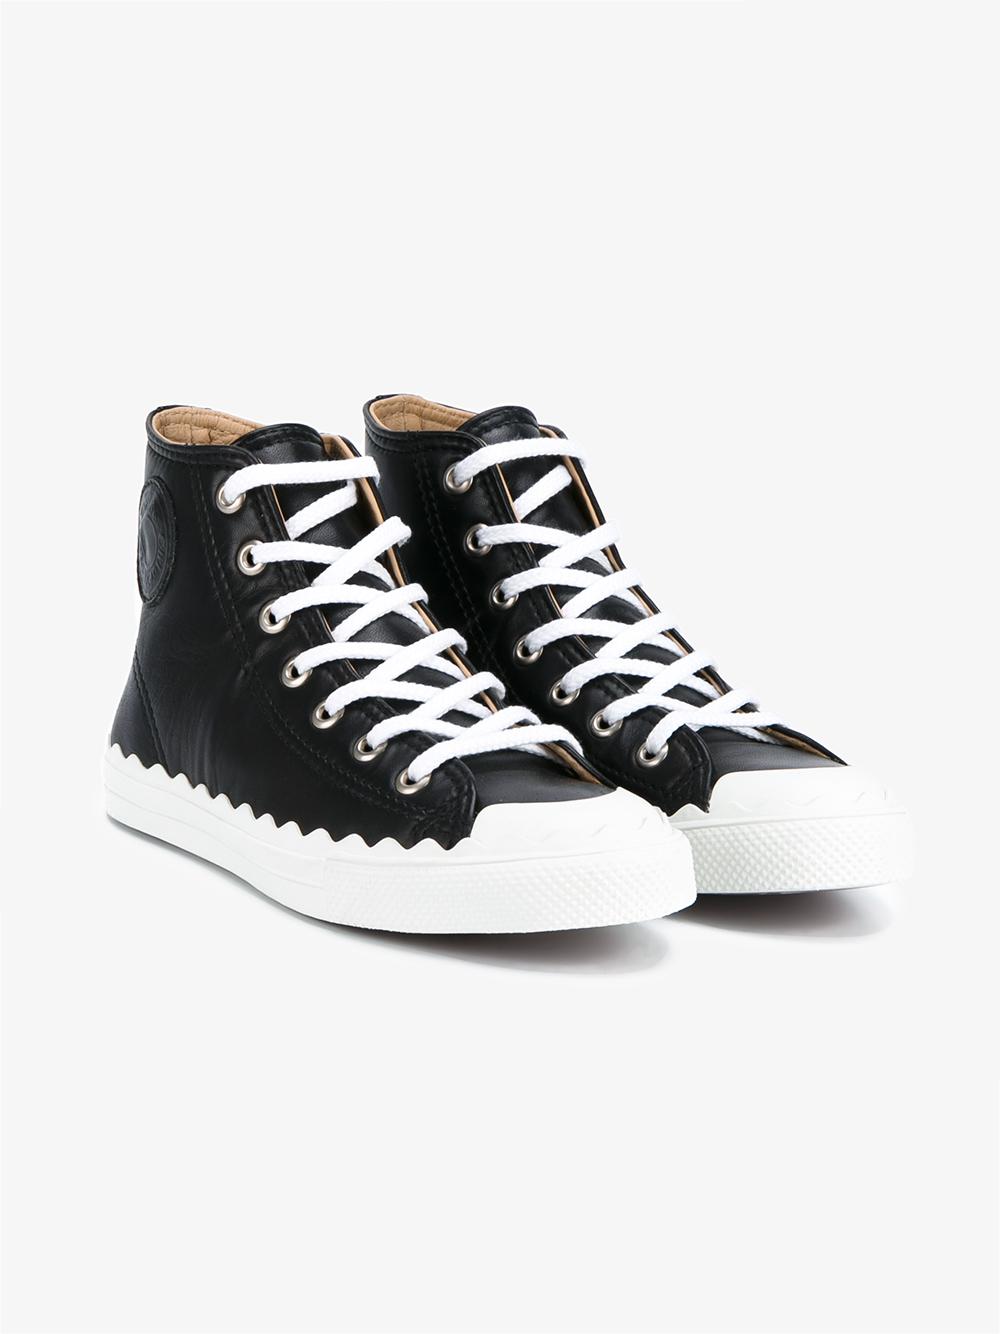 chlo 39 kyle 39 hi top sneakers in black save 56 lyst. Black Bedroom Furniture Sets. Home Design Ideas